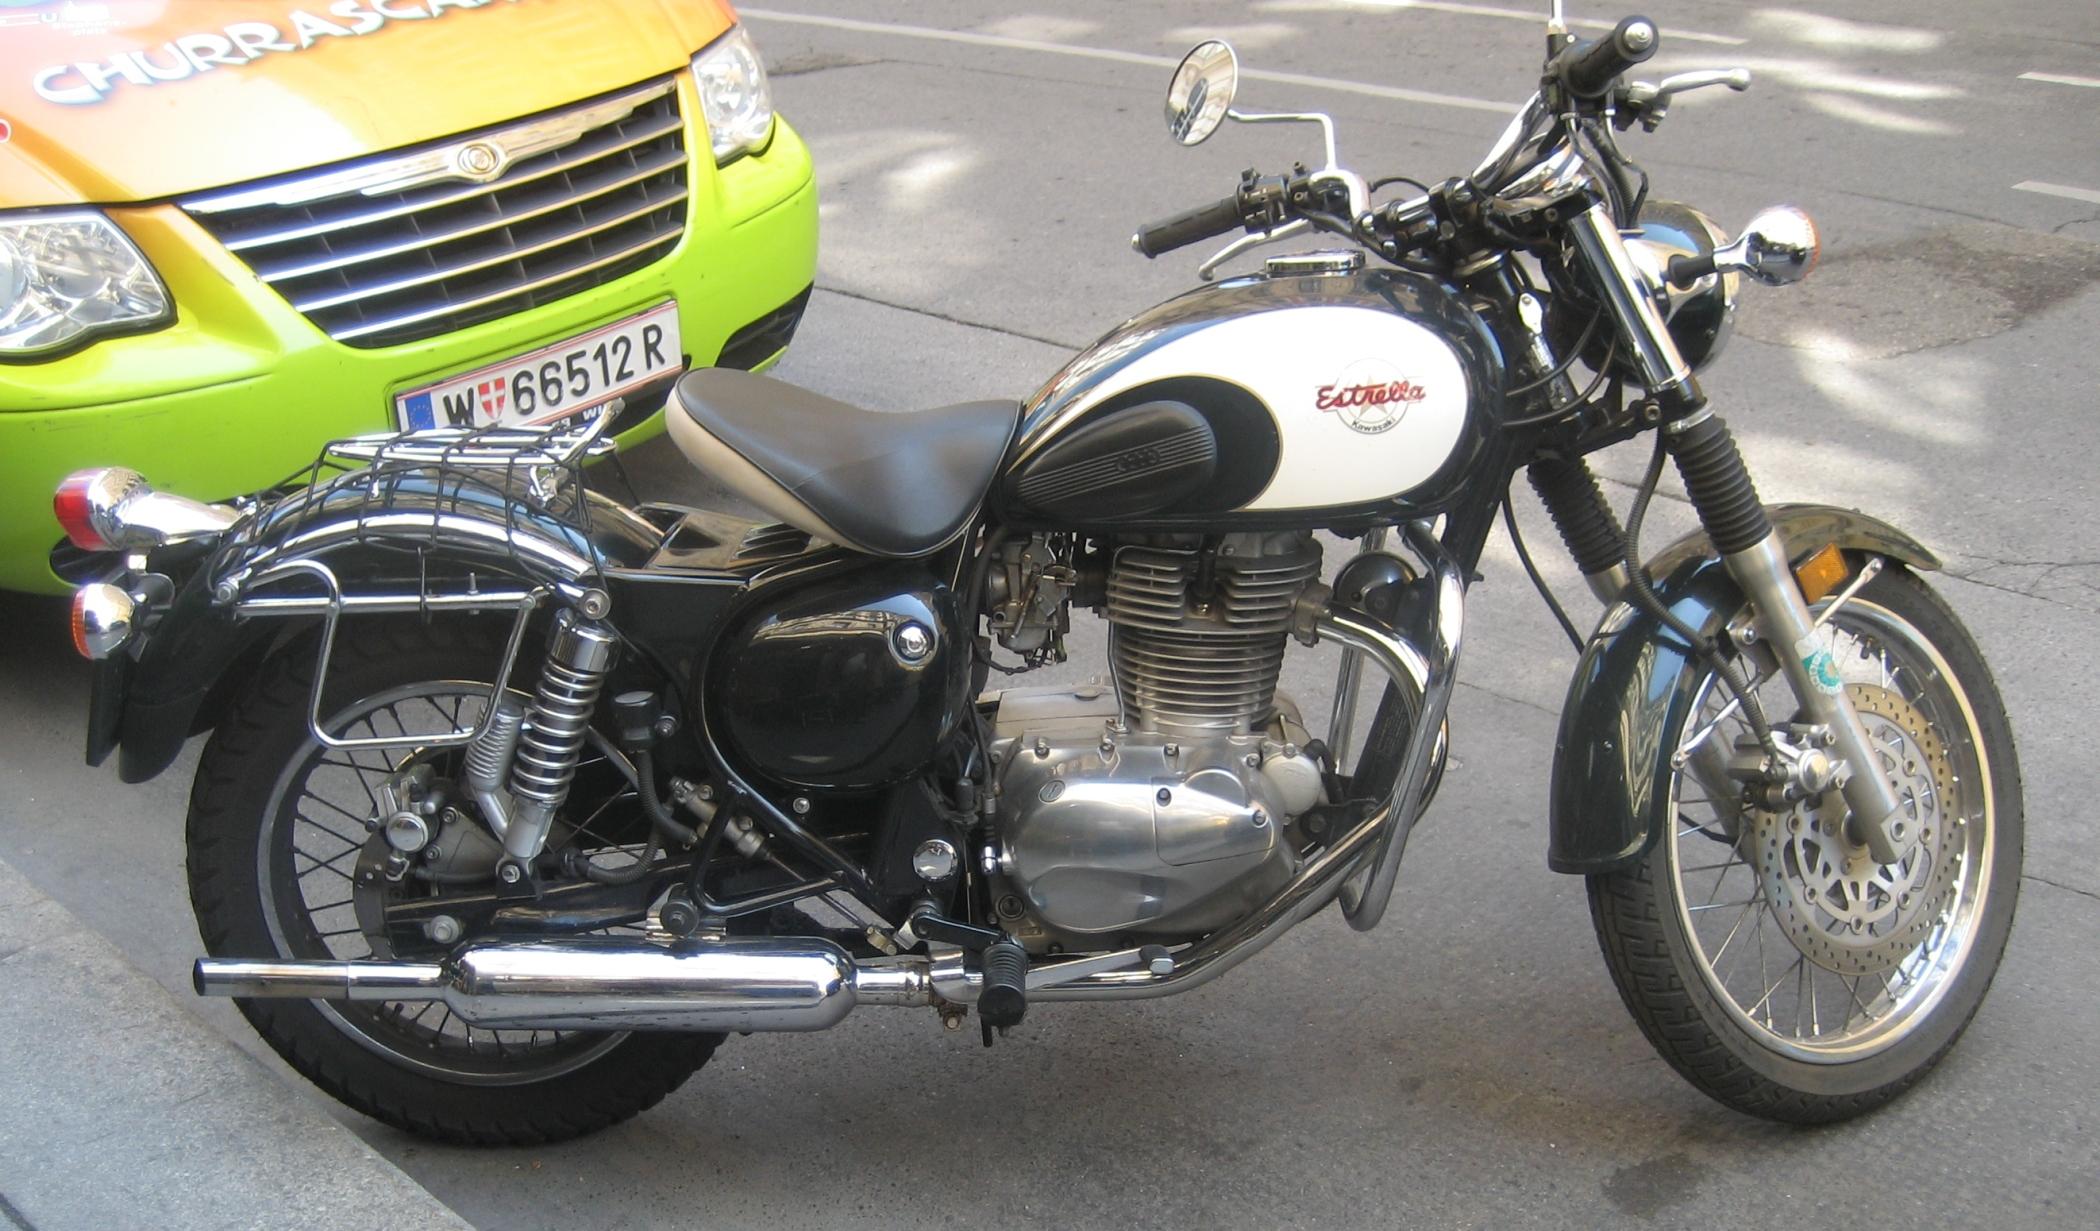 Kawasaki-Estrella-01.jpg